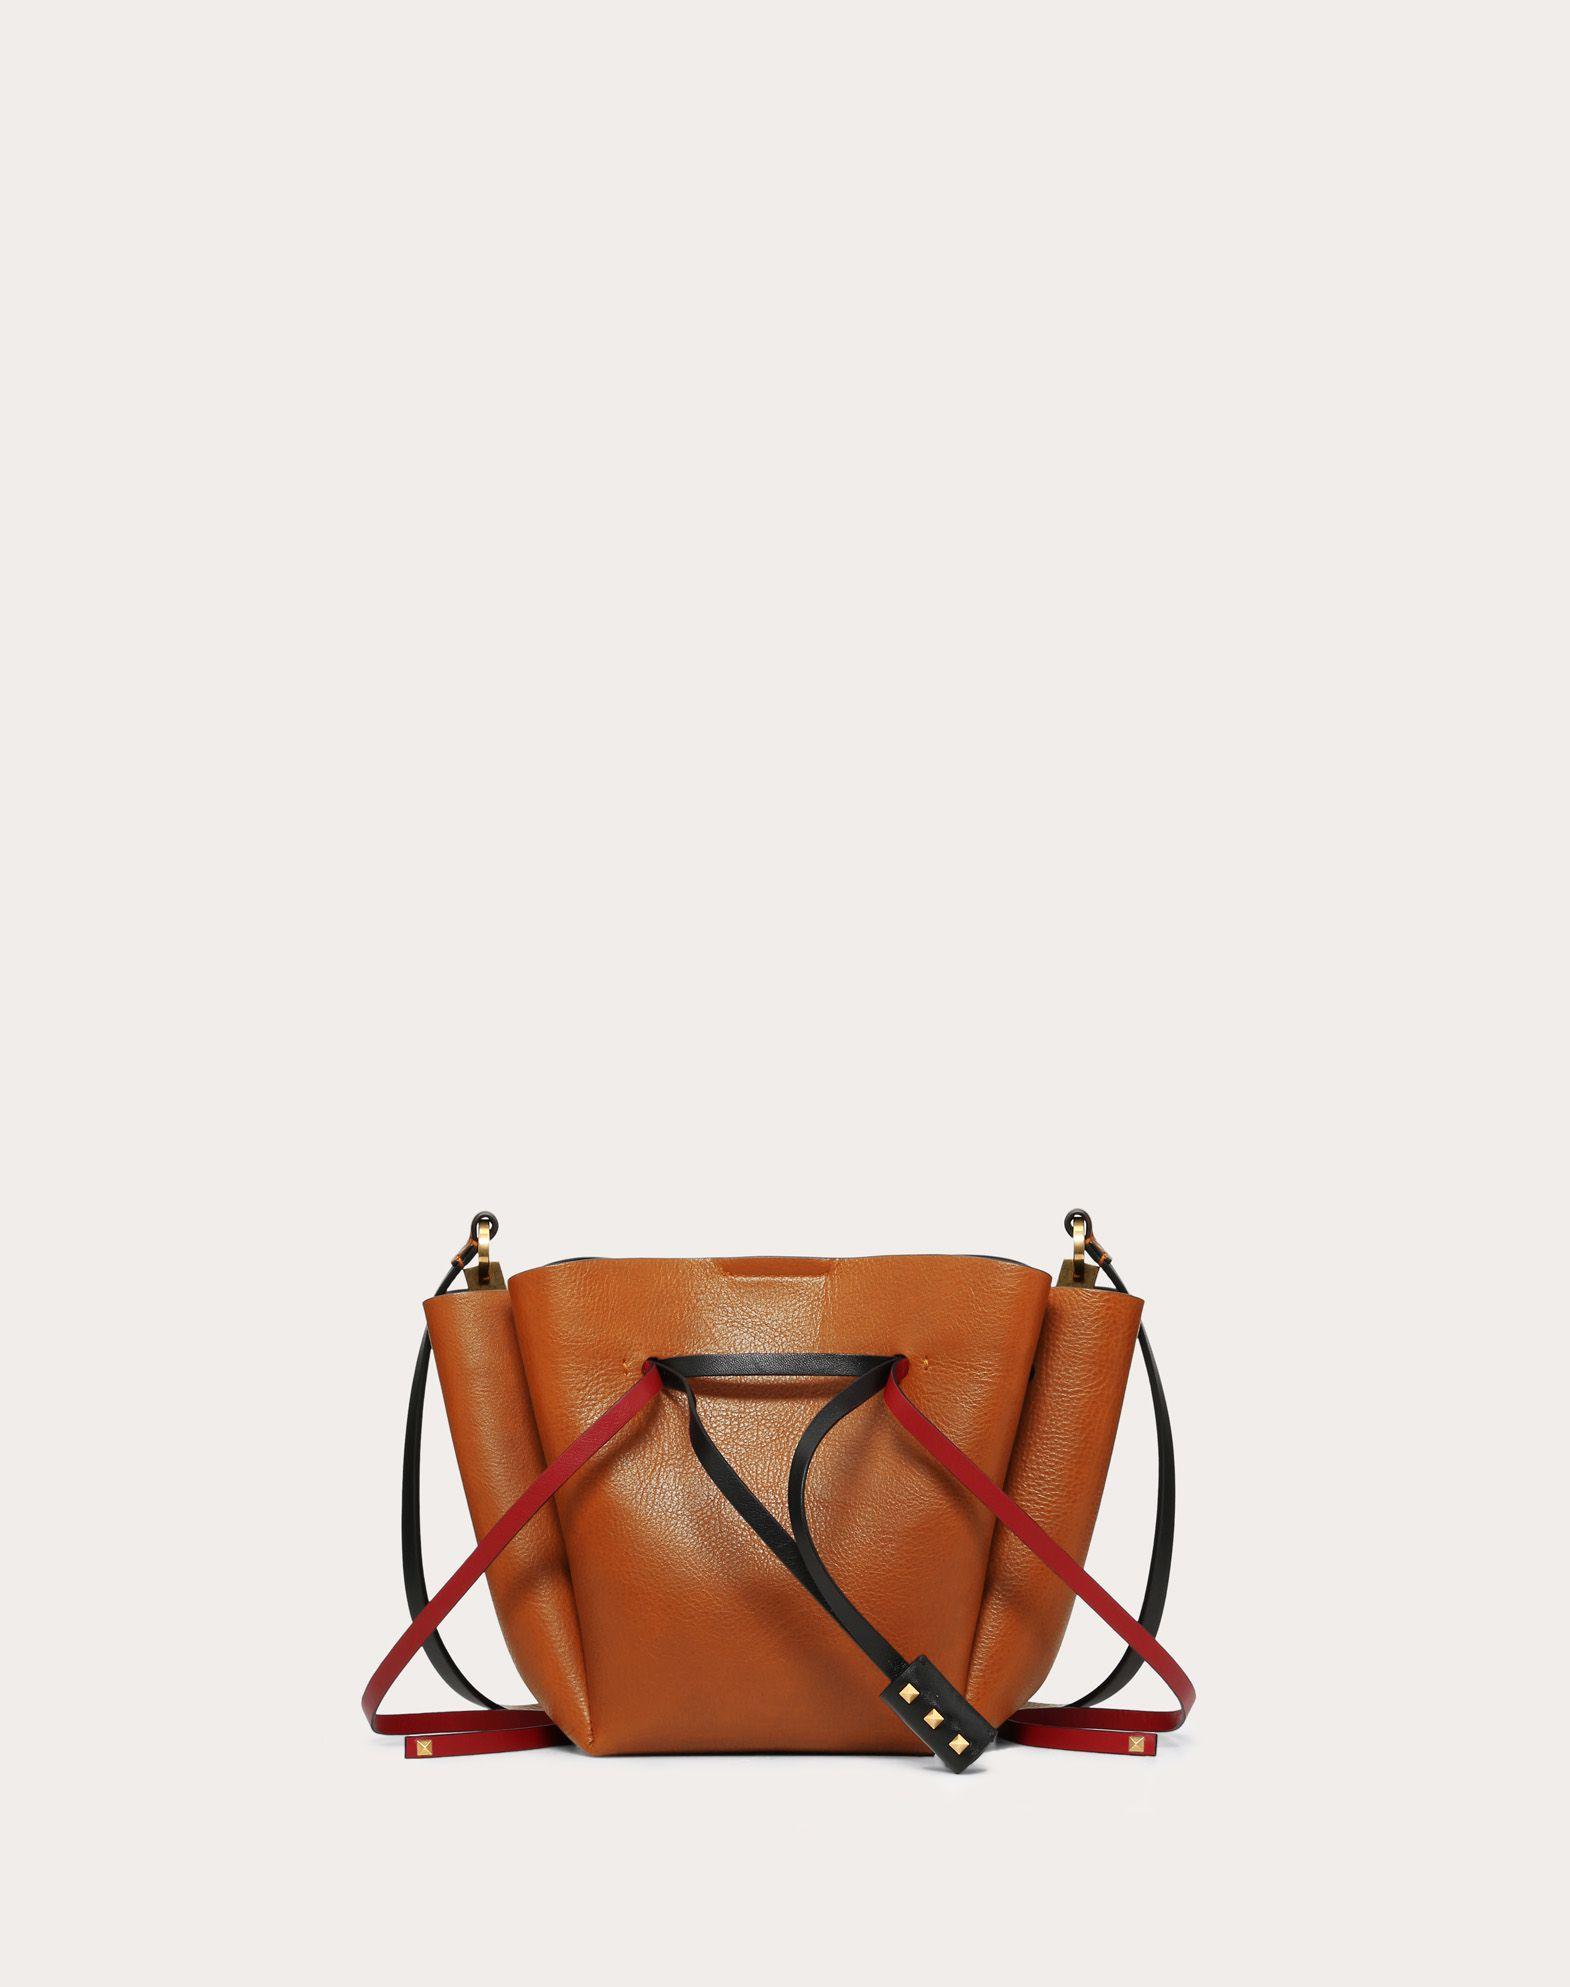 Medium VLOGO Cowhide Bucket Bag